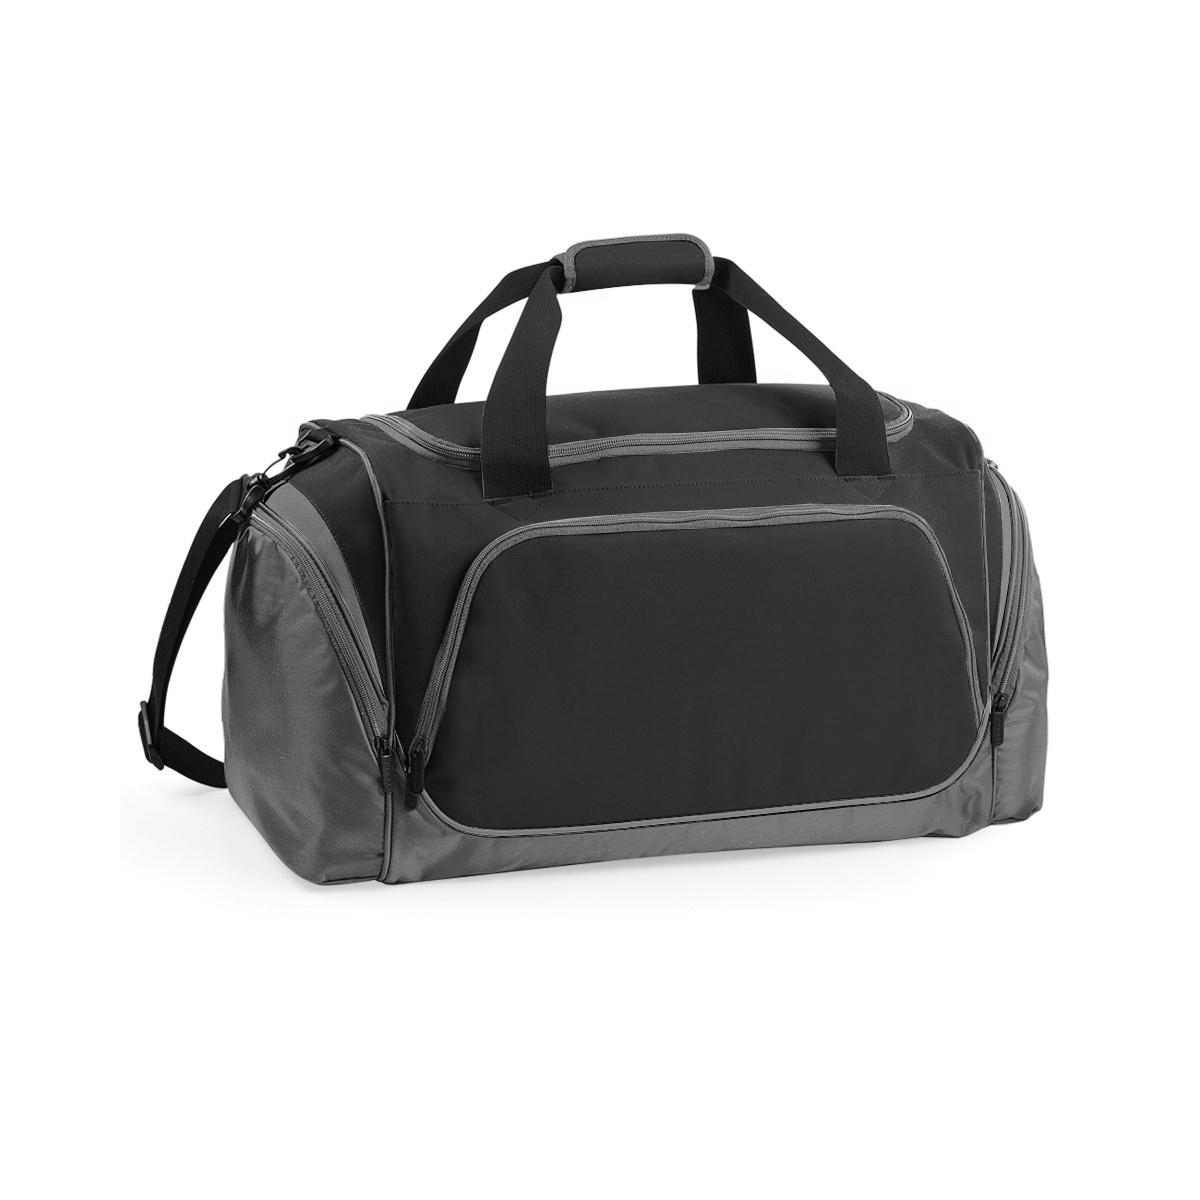 Quadra Pro Team Holdall / Duffle Bag (55 Litres) (One Size) (Black/ Grey)